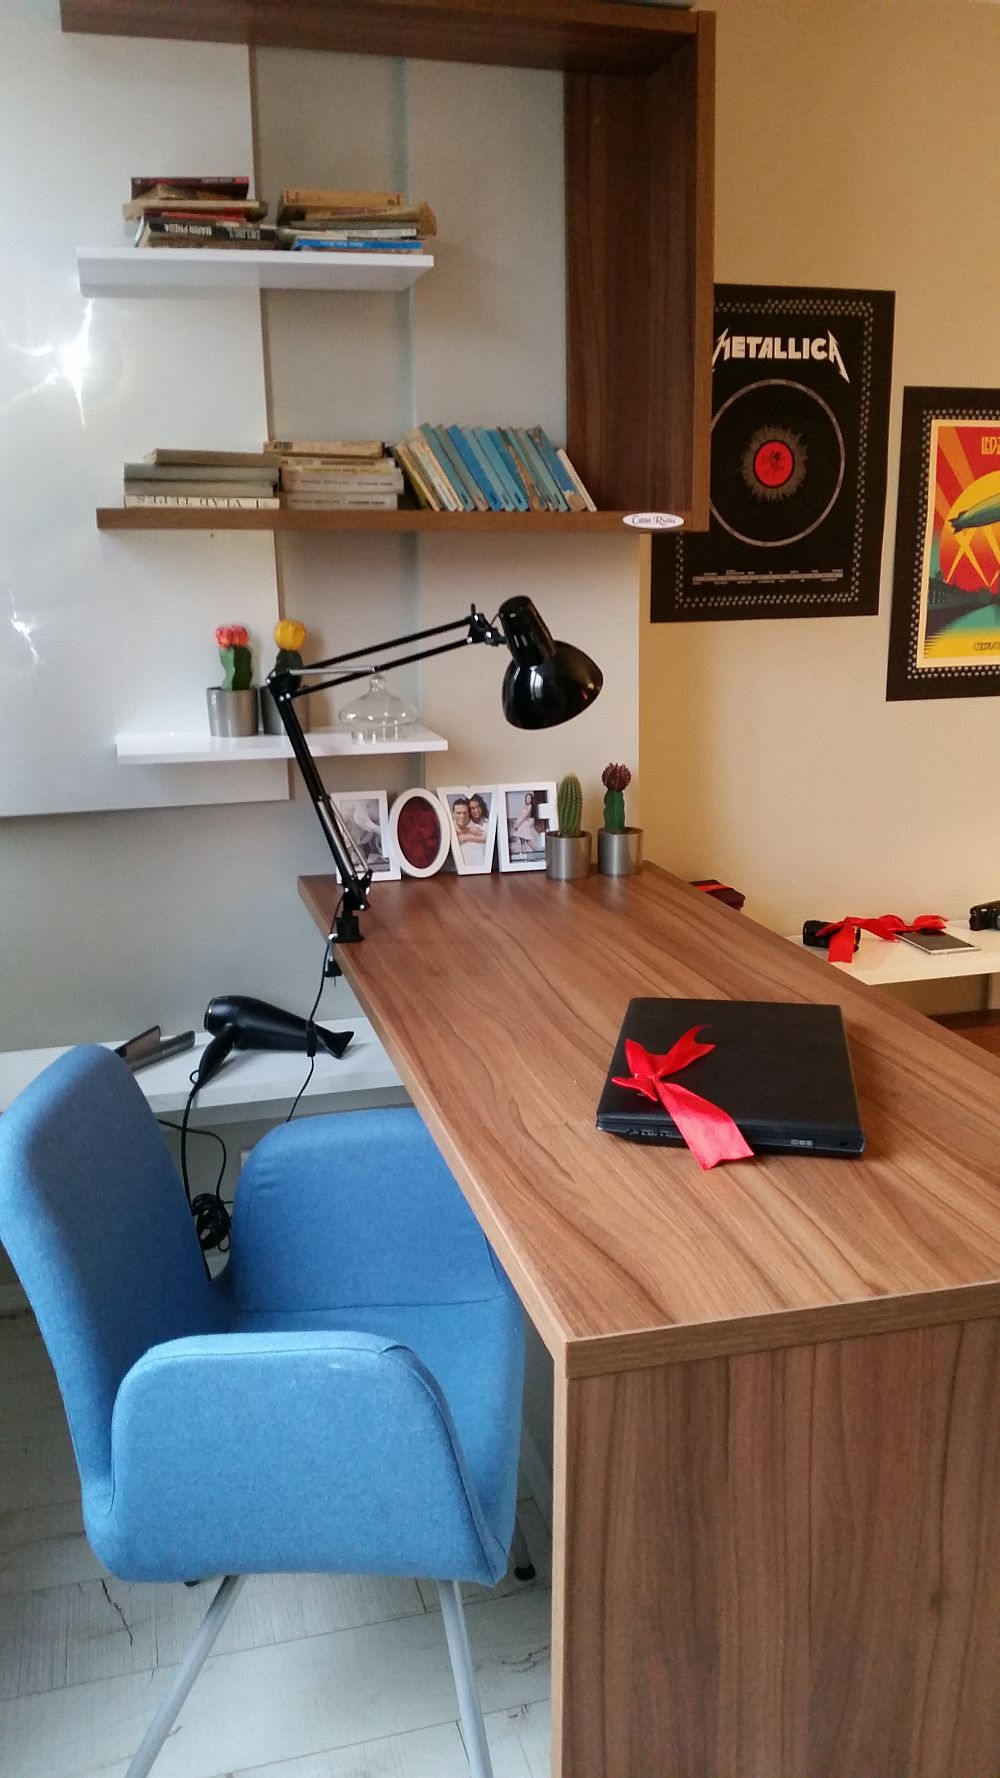 adelaparvu.com despre amenajare apartament Alice Muller din emisiunea Visuri la cheie de la ProTV, sezonul I, 2014 (15)